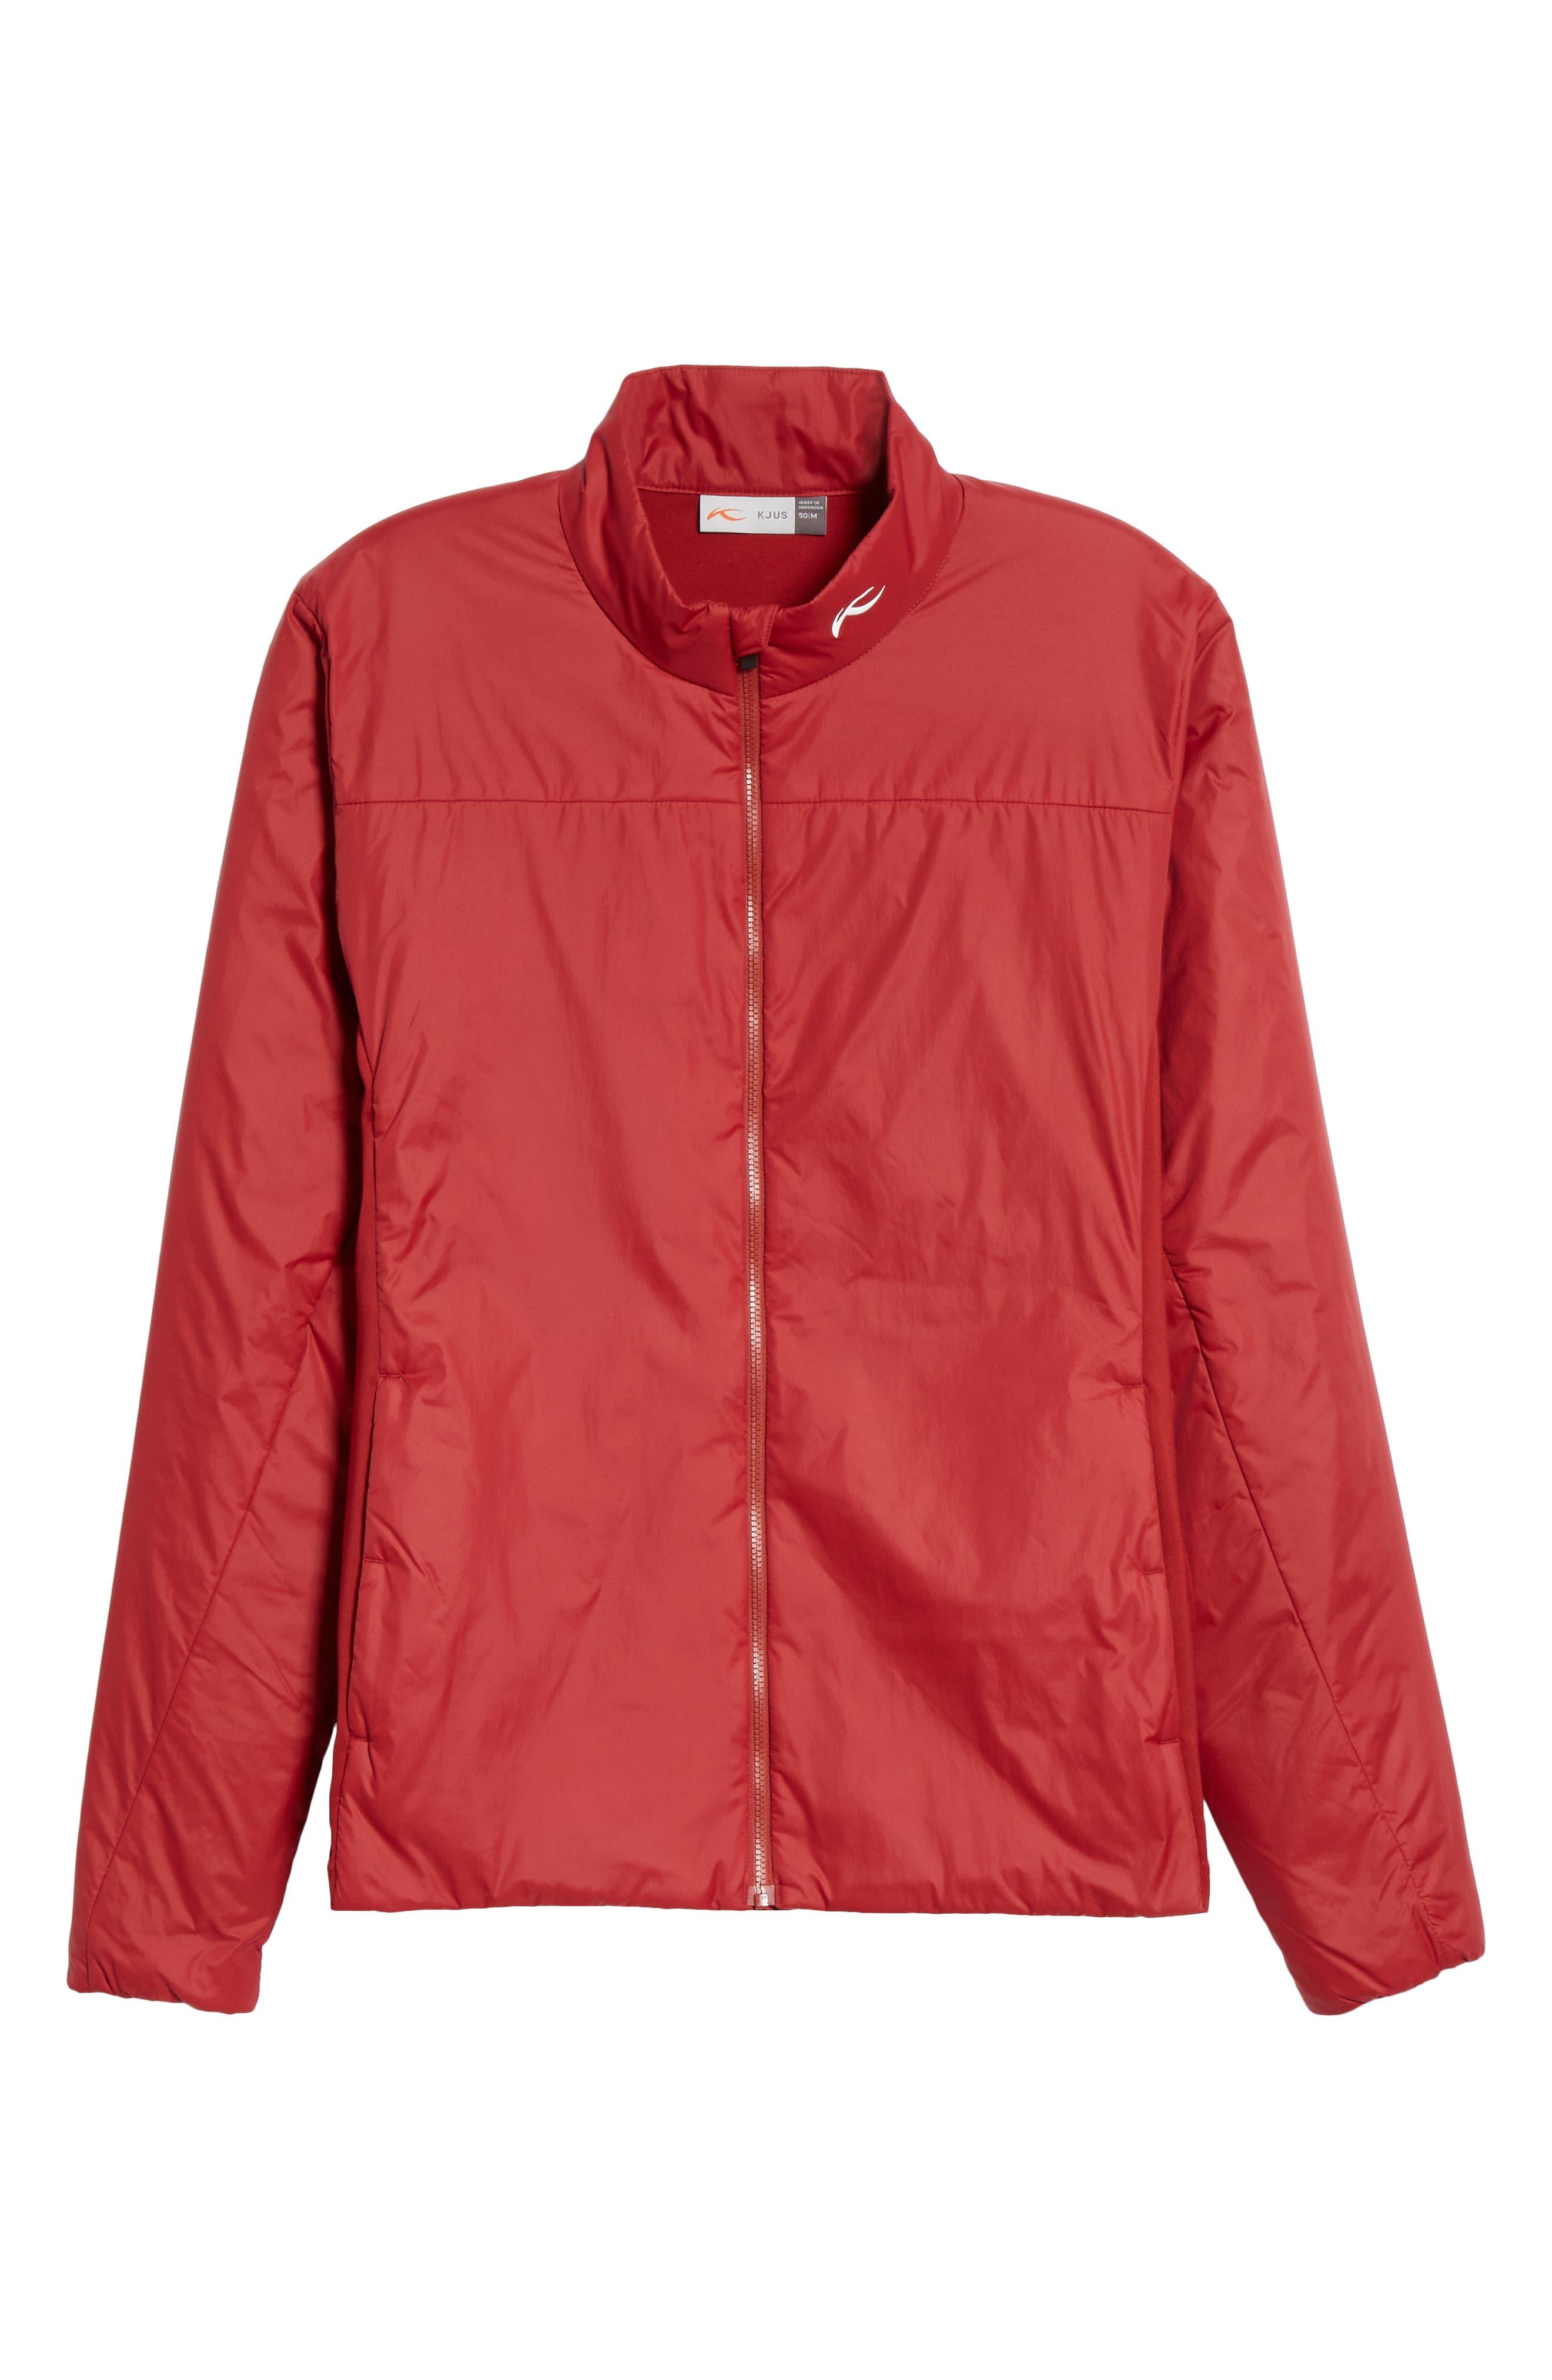 Radiation Waterproof Jacket,                             Main thumbnail 1, color,                             RED DAHLIA